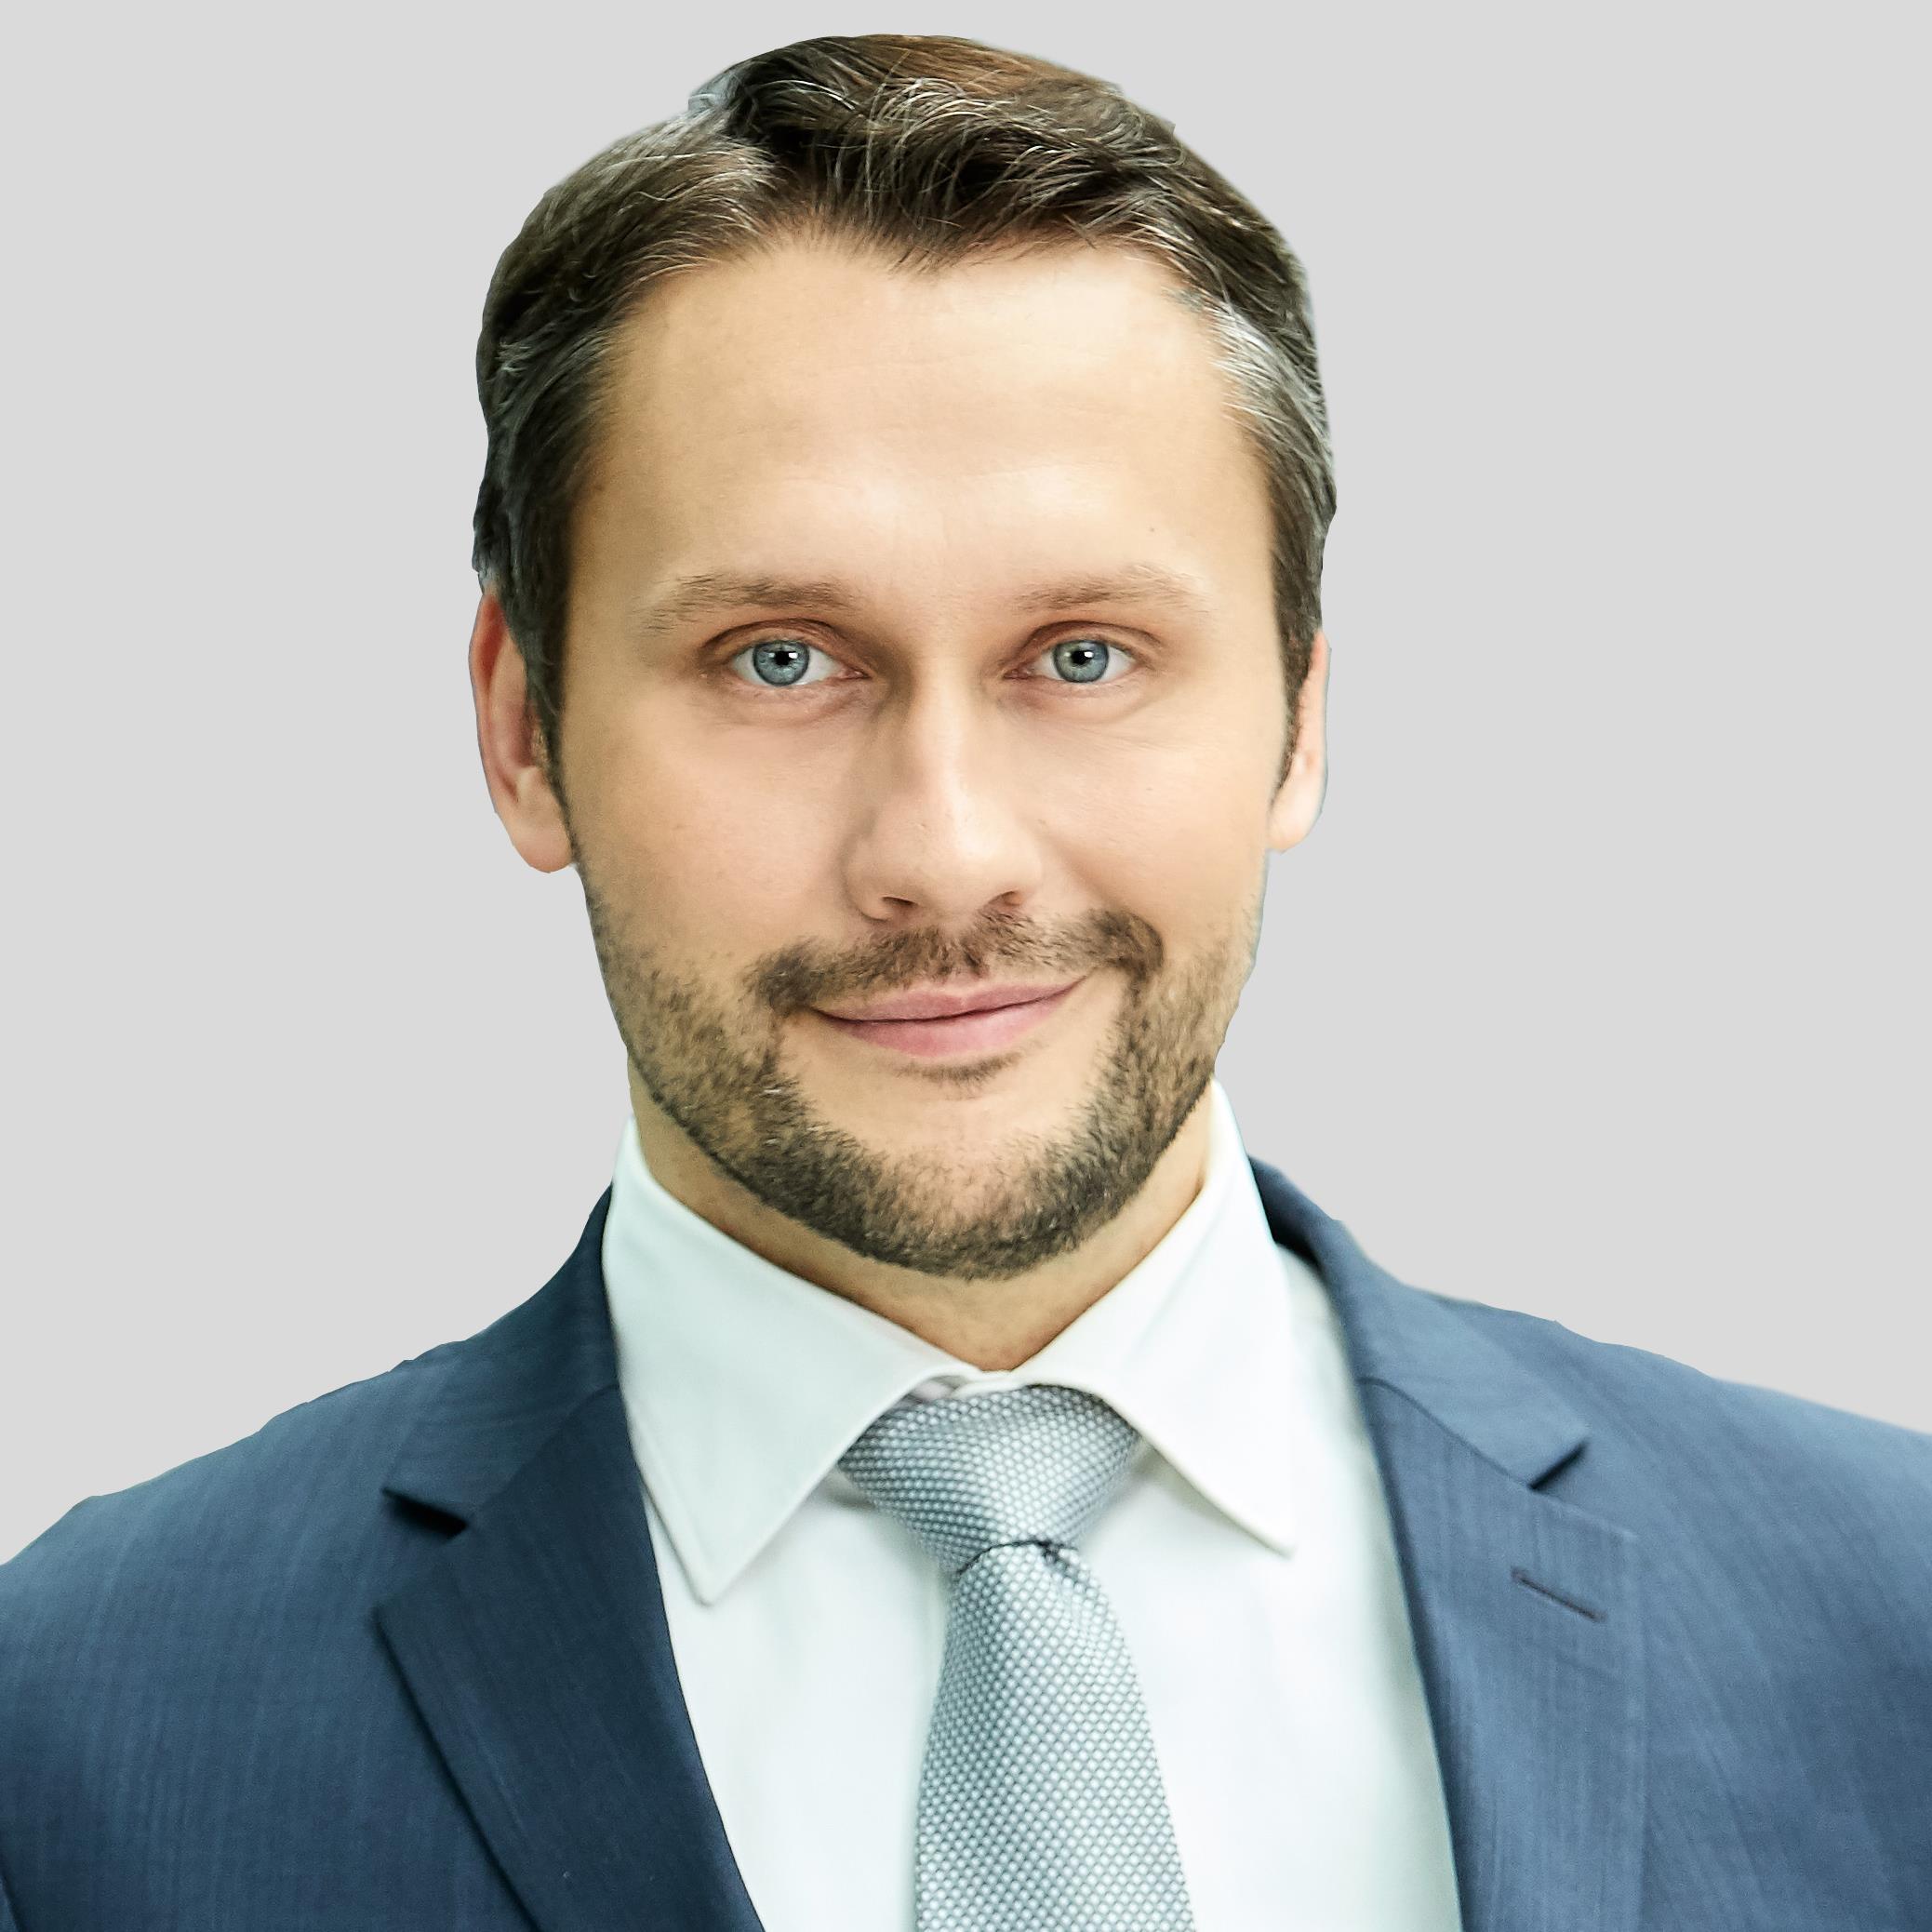 Sergej Epp Plain background.jpg